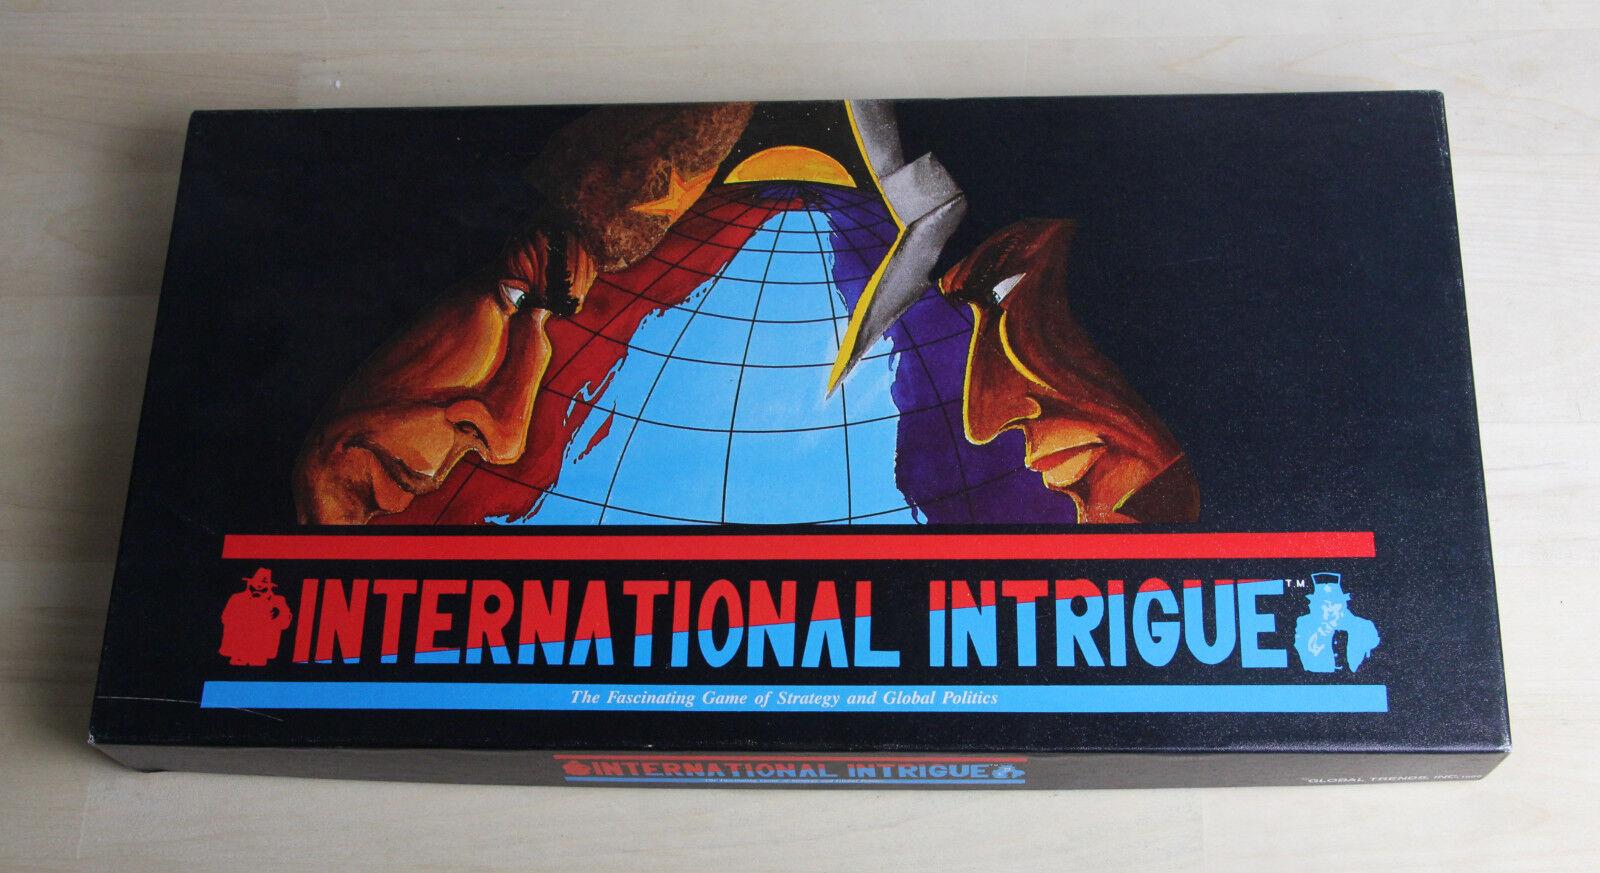 INTERNATIONAL INTRIGUE Board Game Global Trends Inc 1986 Strategy Politics